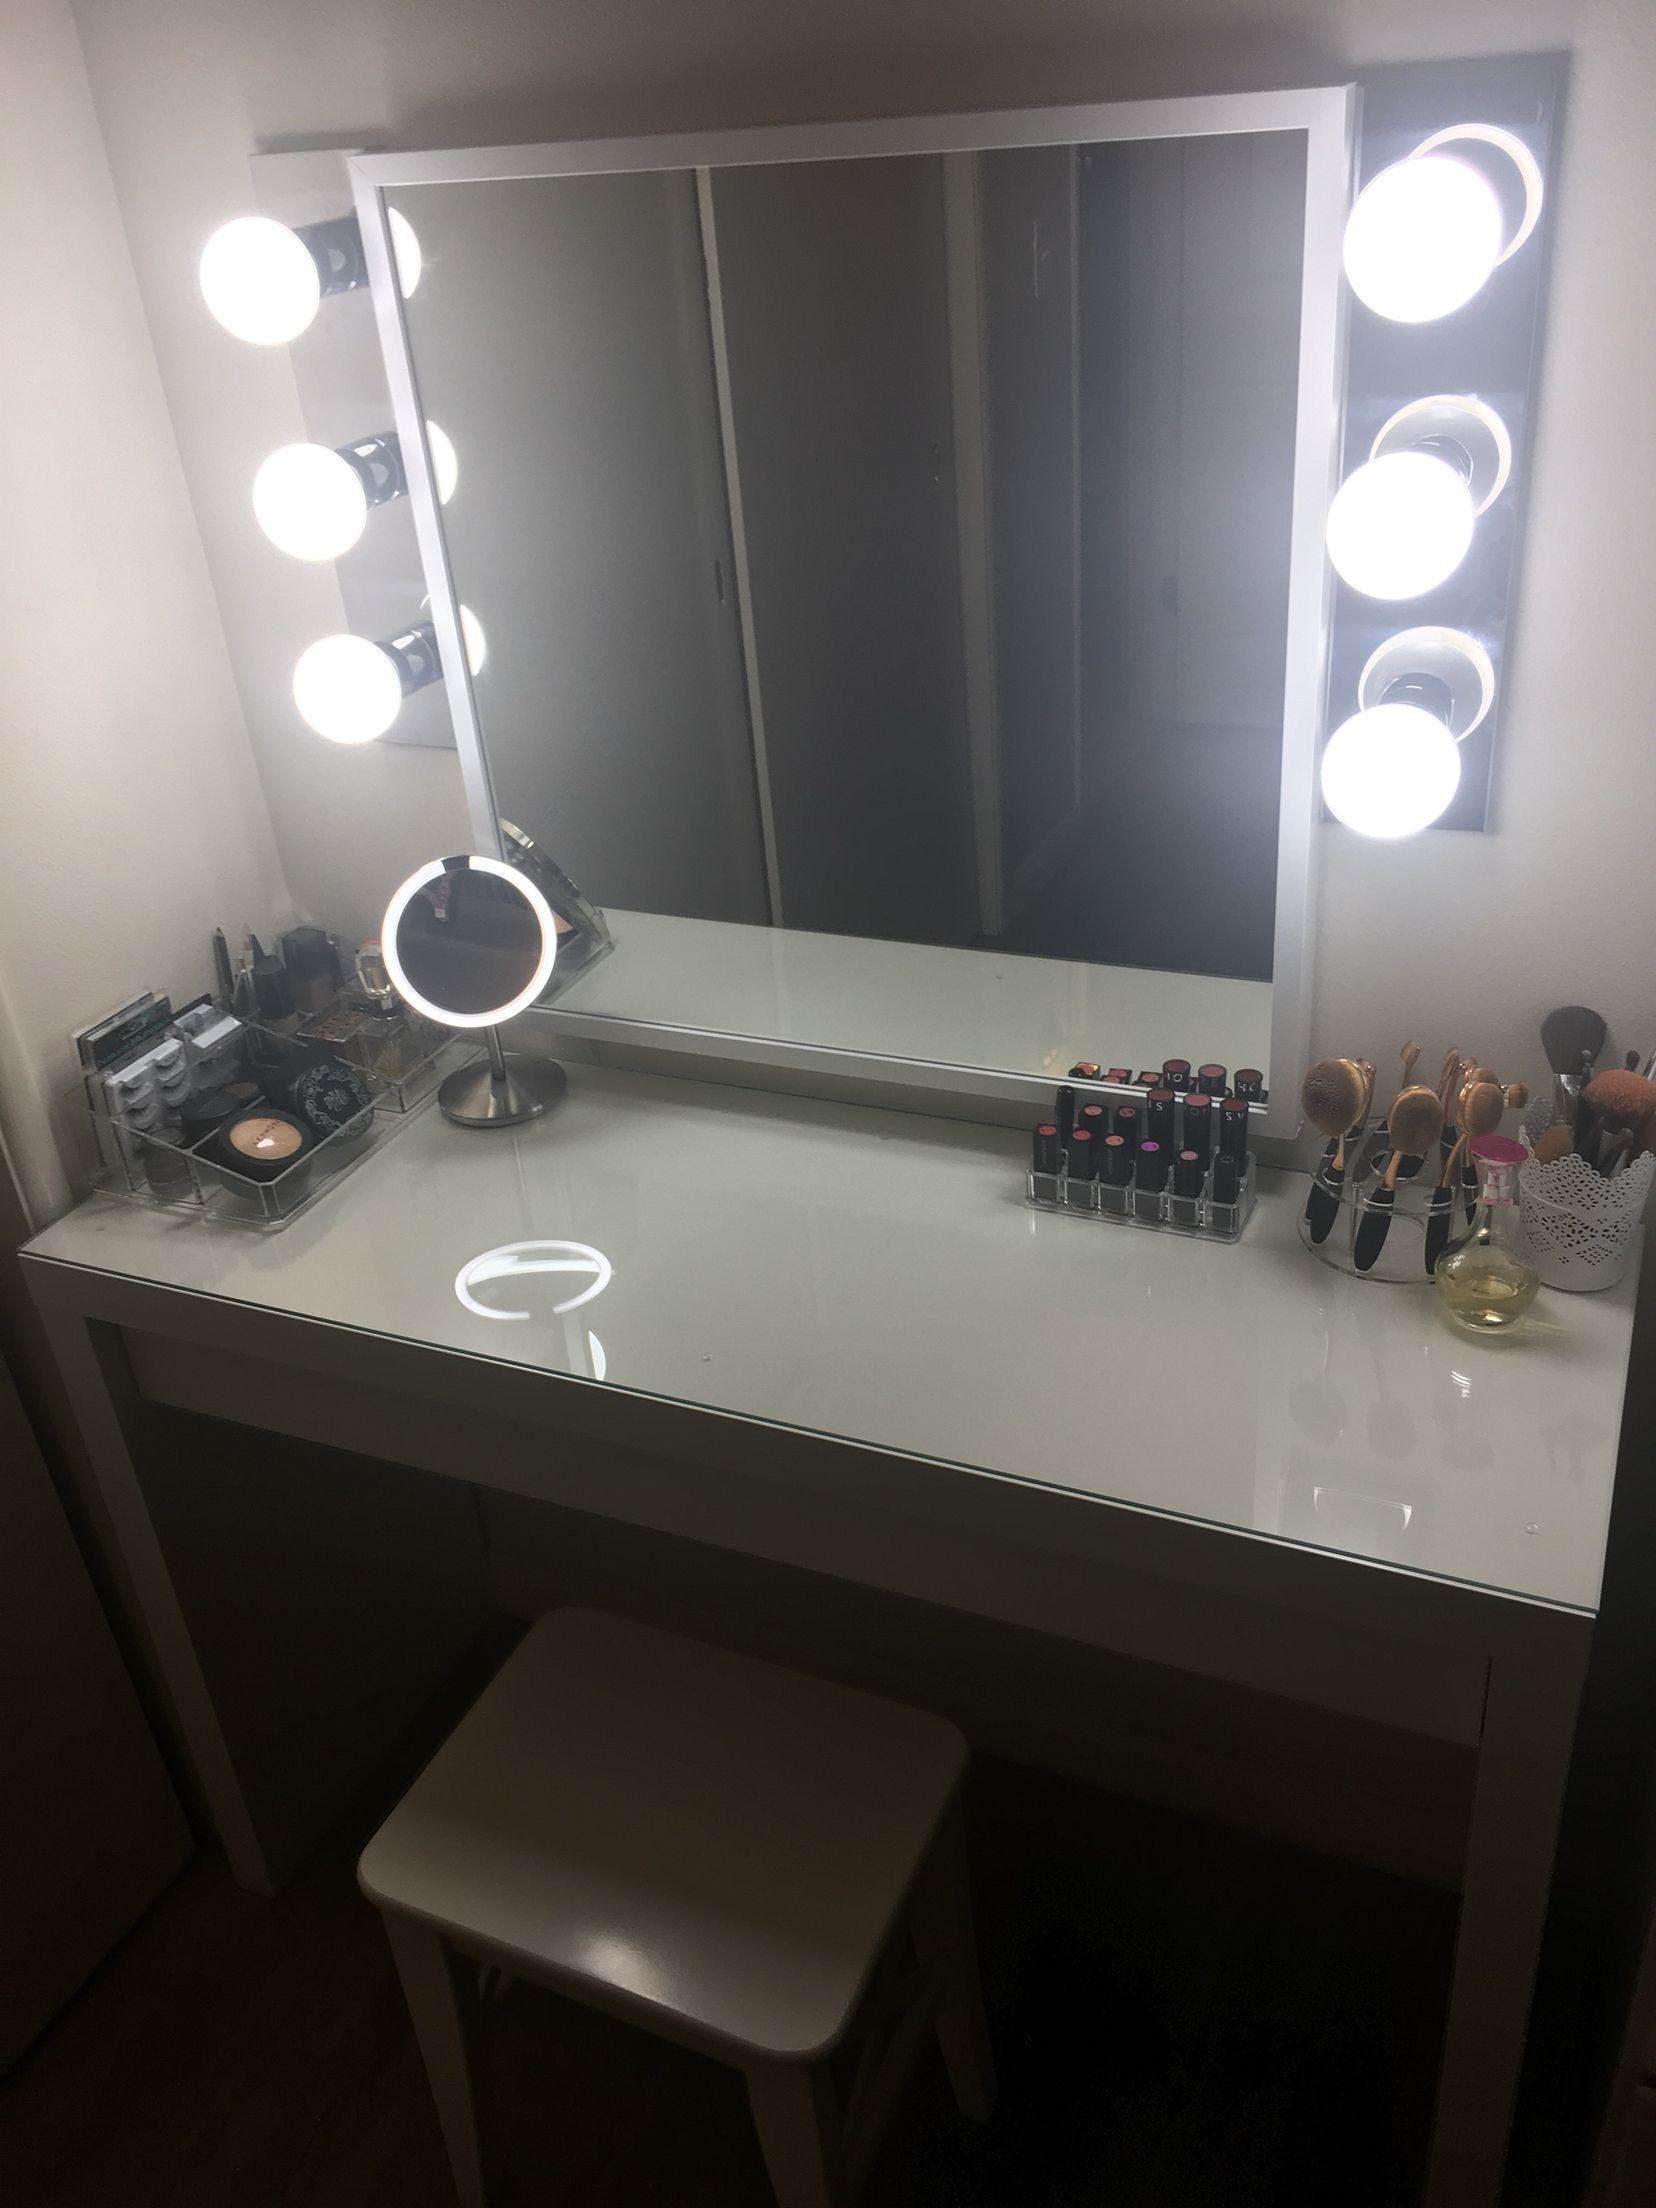 Hollywood Vanity Under $300: Ikea Malm Vanity, Ikea Mirror, Walmart  Bathroom Light Bars